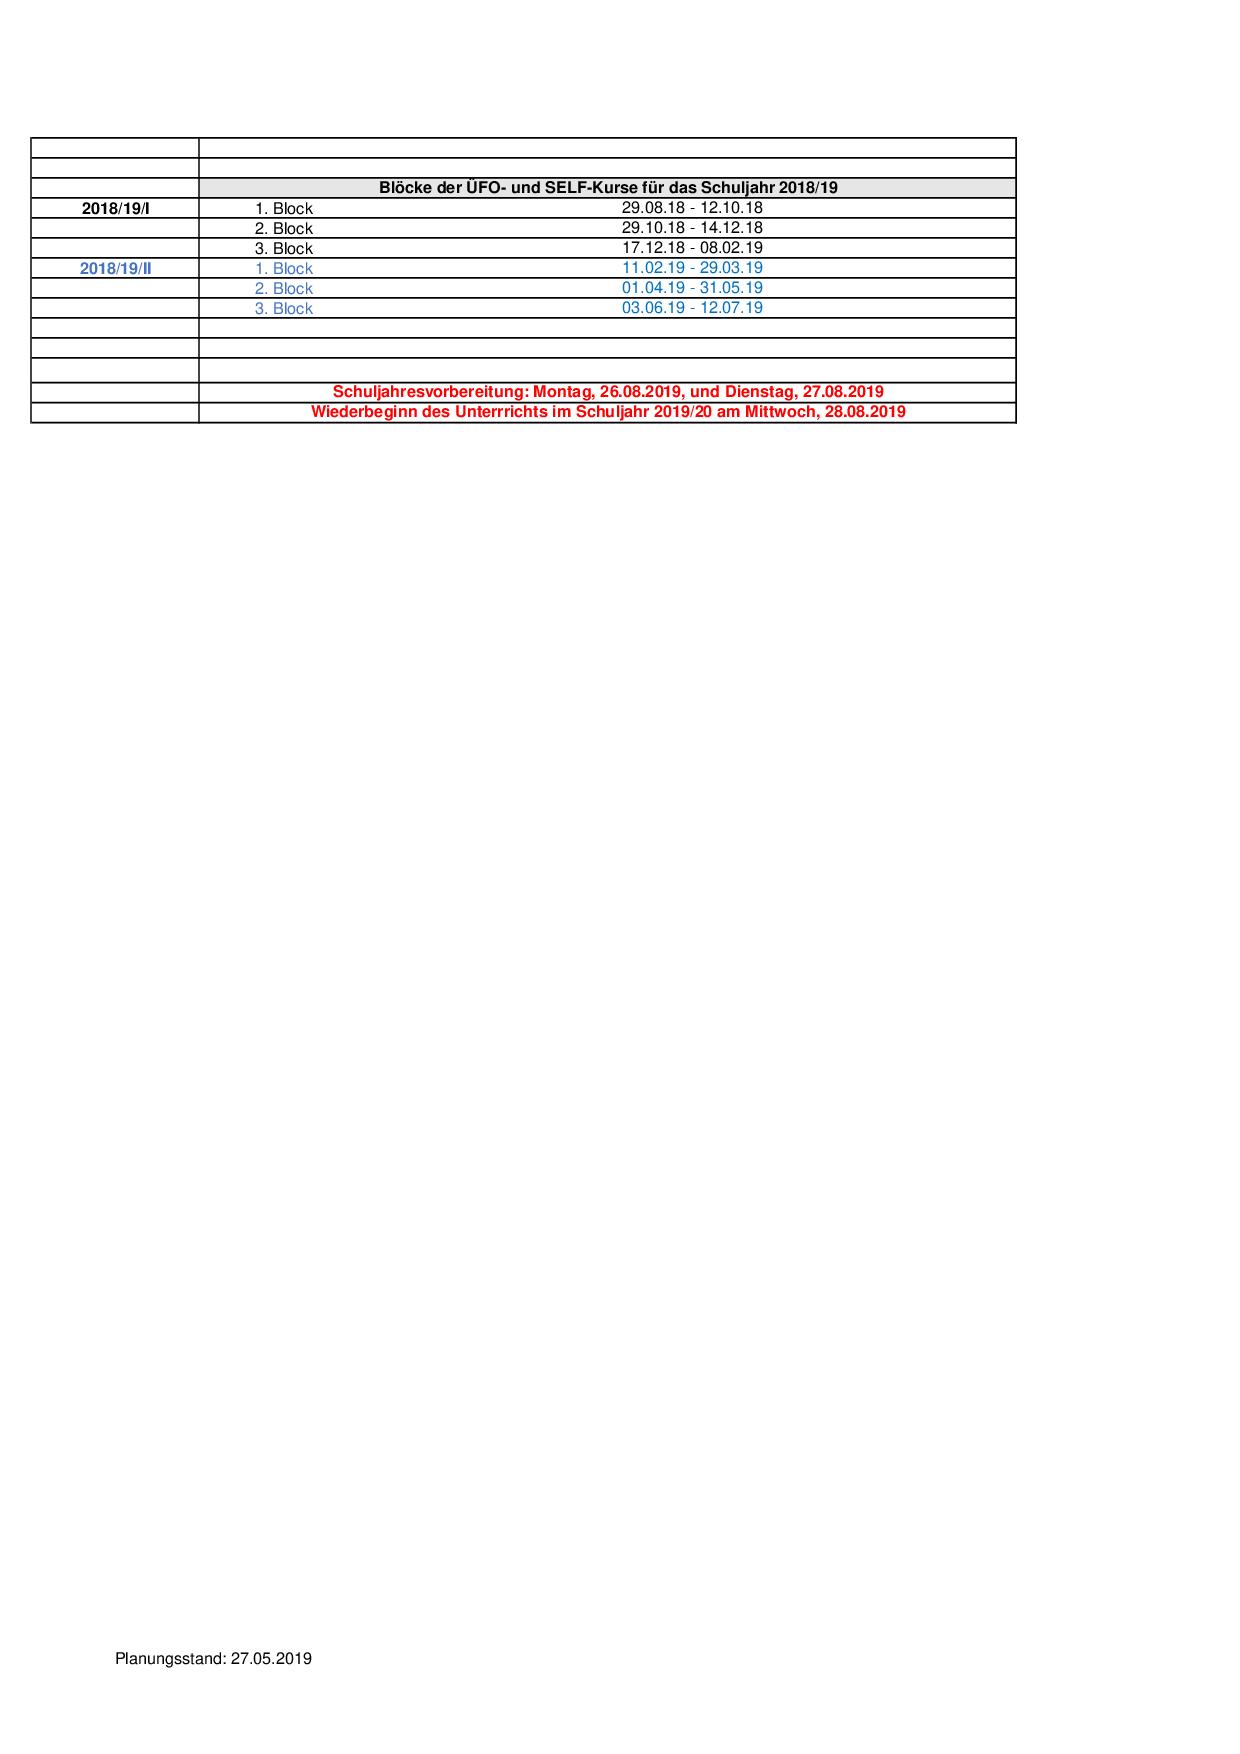 GV_Terminplan_2018-2019_2HJ-005